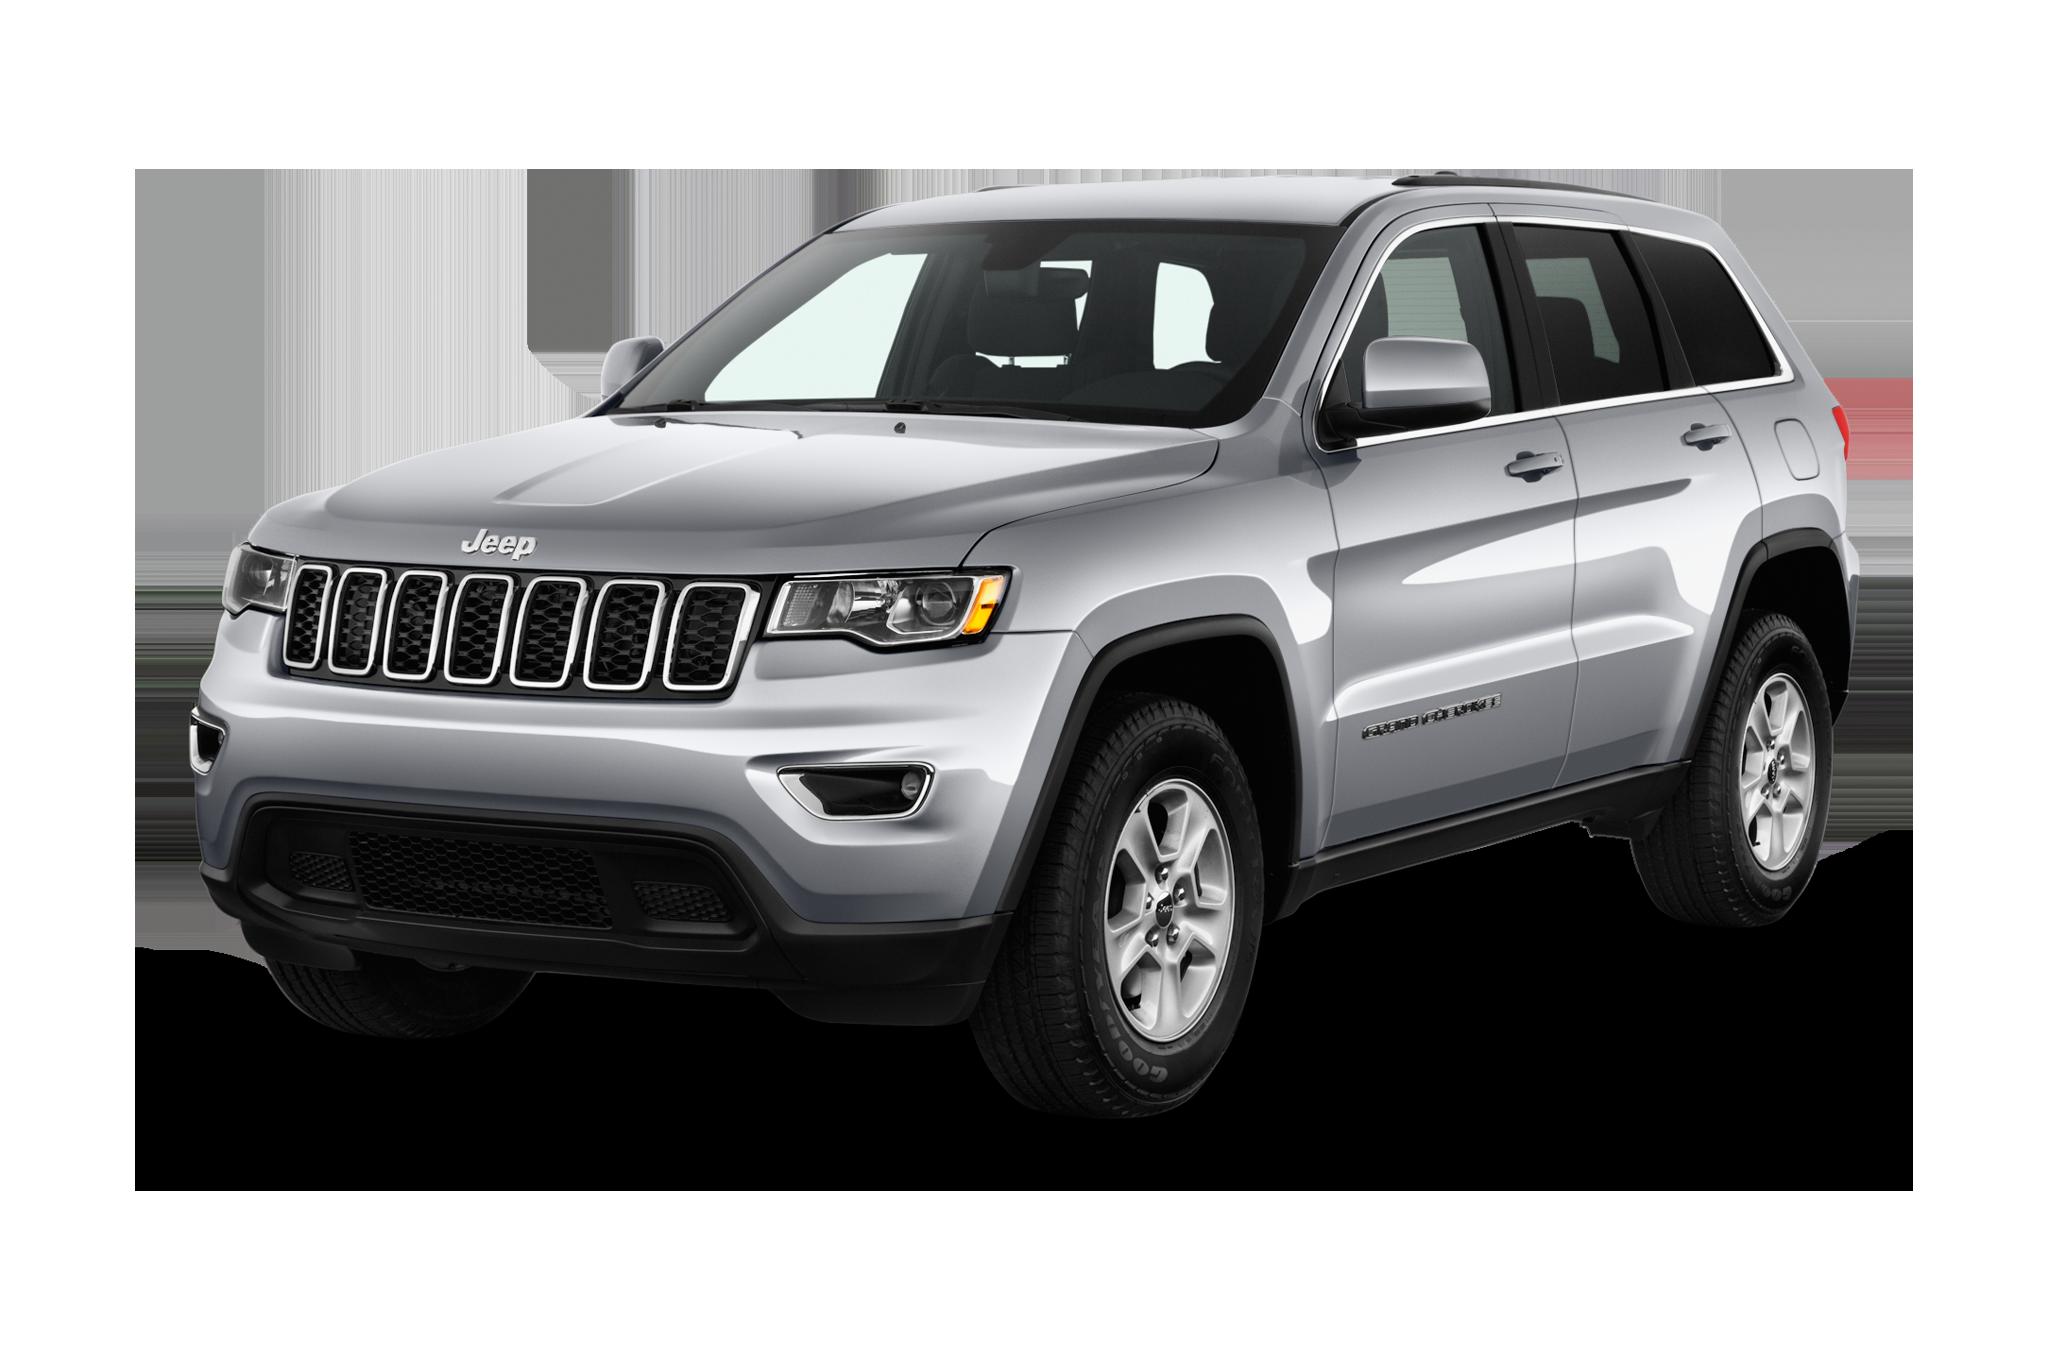 jeep grand cherokee trackhawk coming july 2017. Black Bedroom Furniture Sets. Home Design Ideas